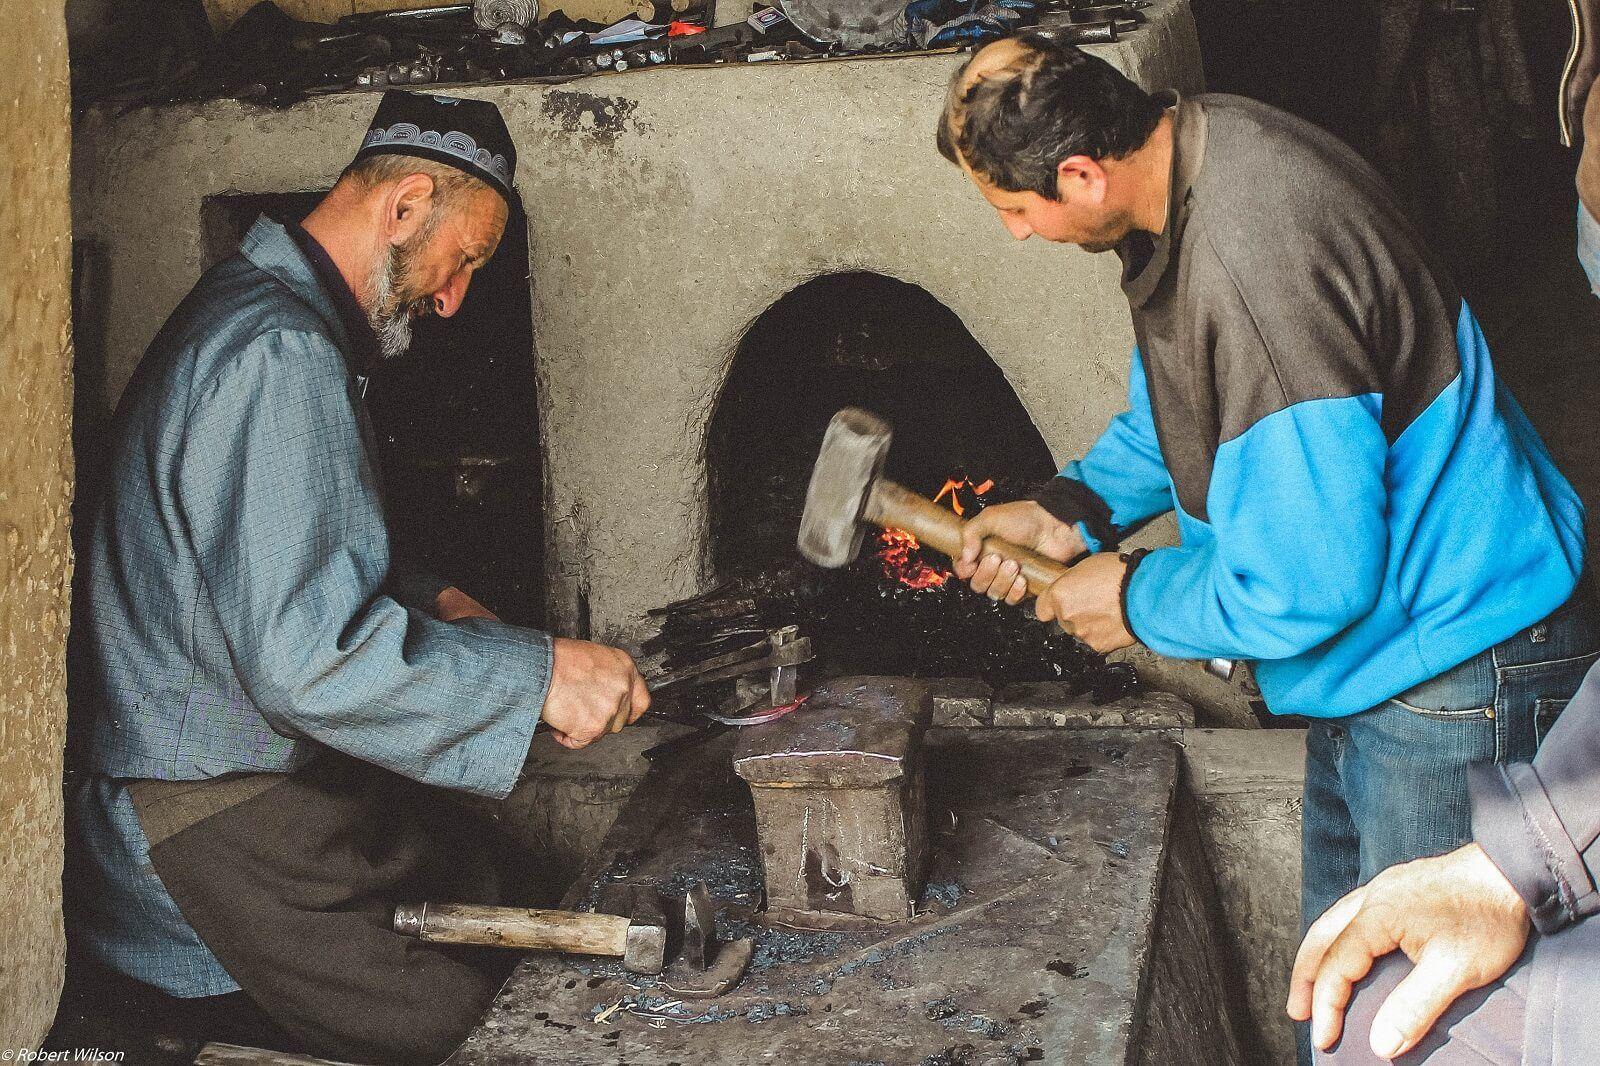 Best of Central Asia Tour Blacksmiths in Istaravshan making knives